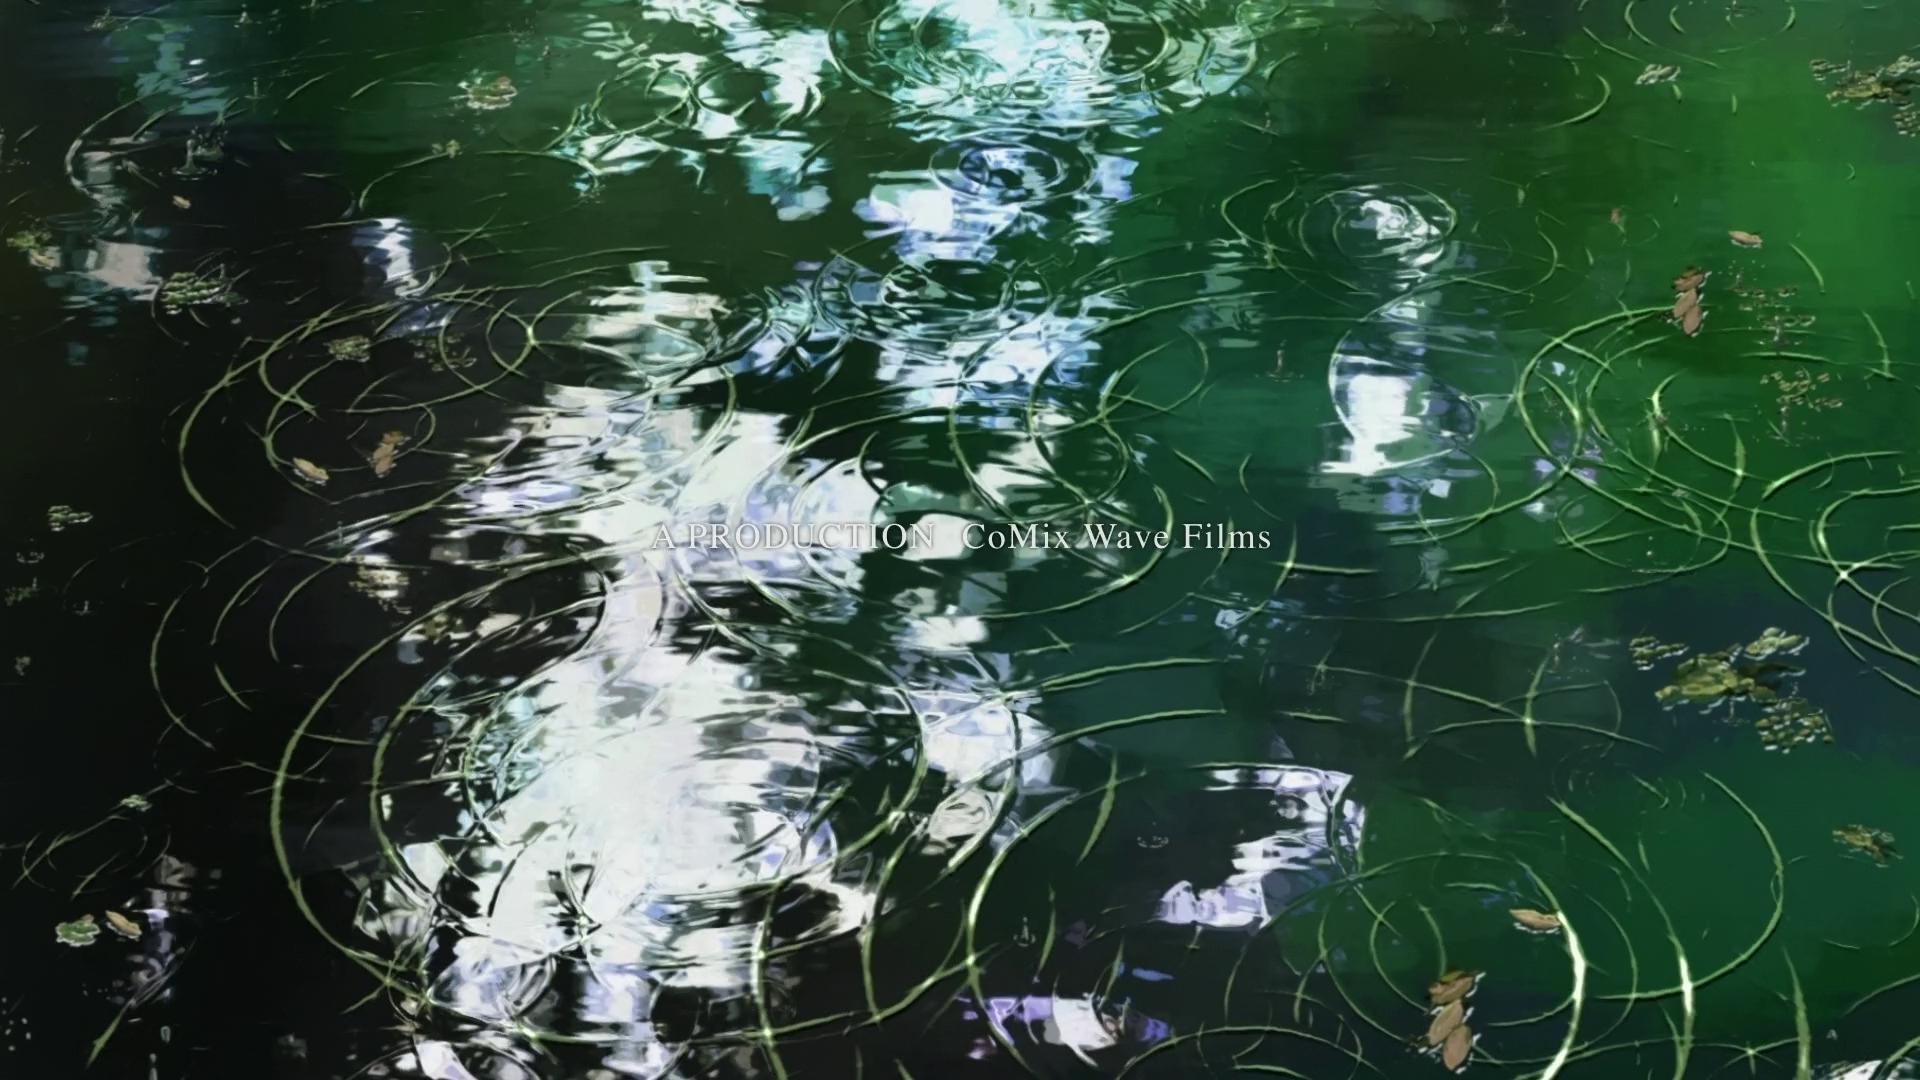 The Garden Of Words Makoto Shinkai Wallpaper 42699895 Fanpop